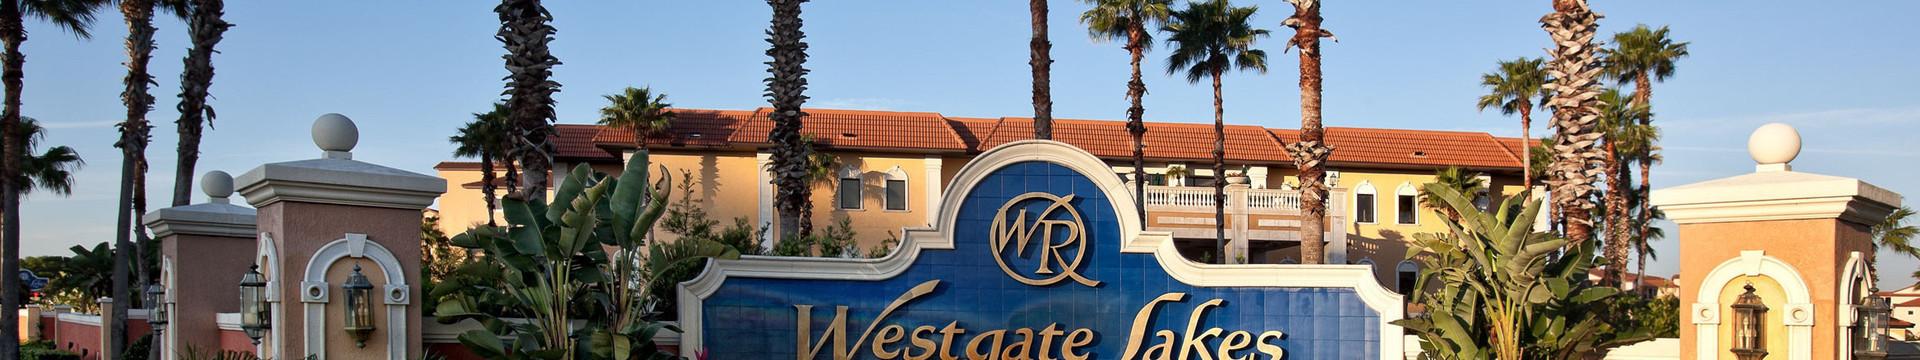 Westgate Lakes sign - Westgate Resorts